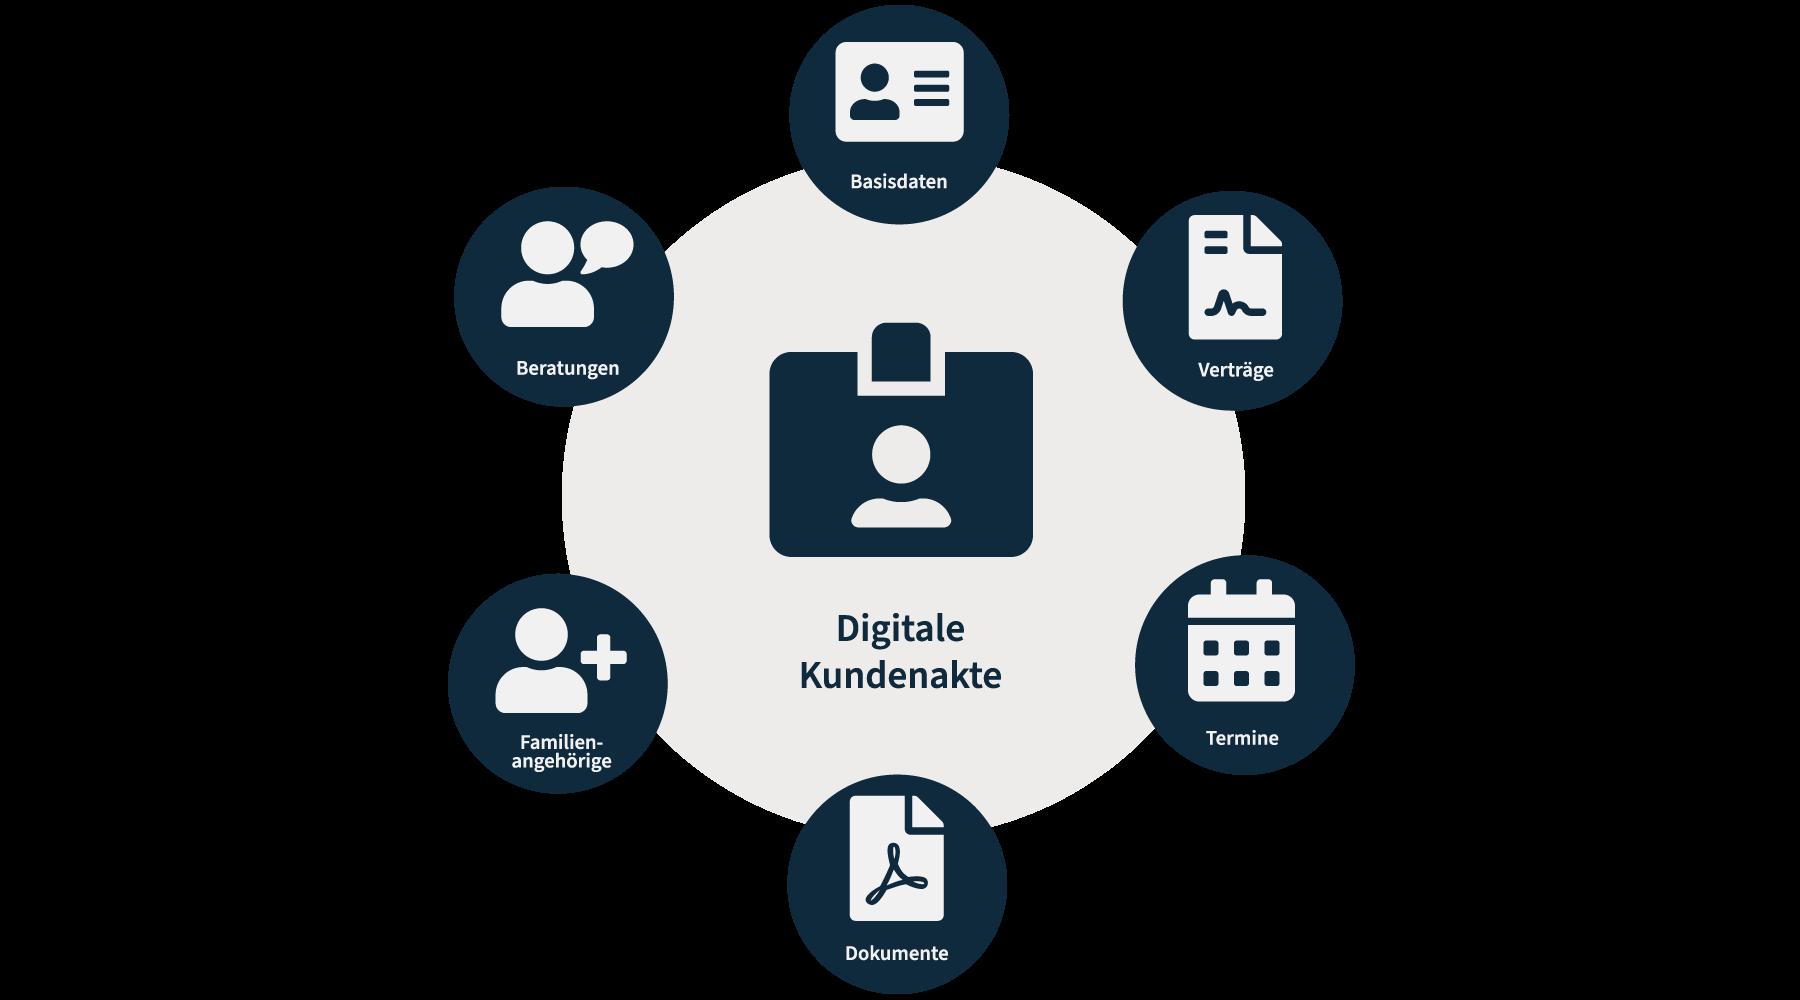 Digitale Kundenakte